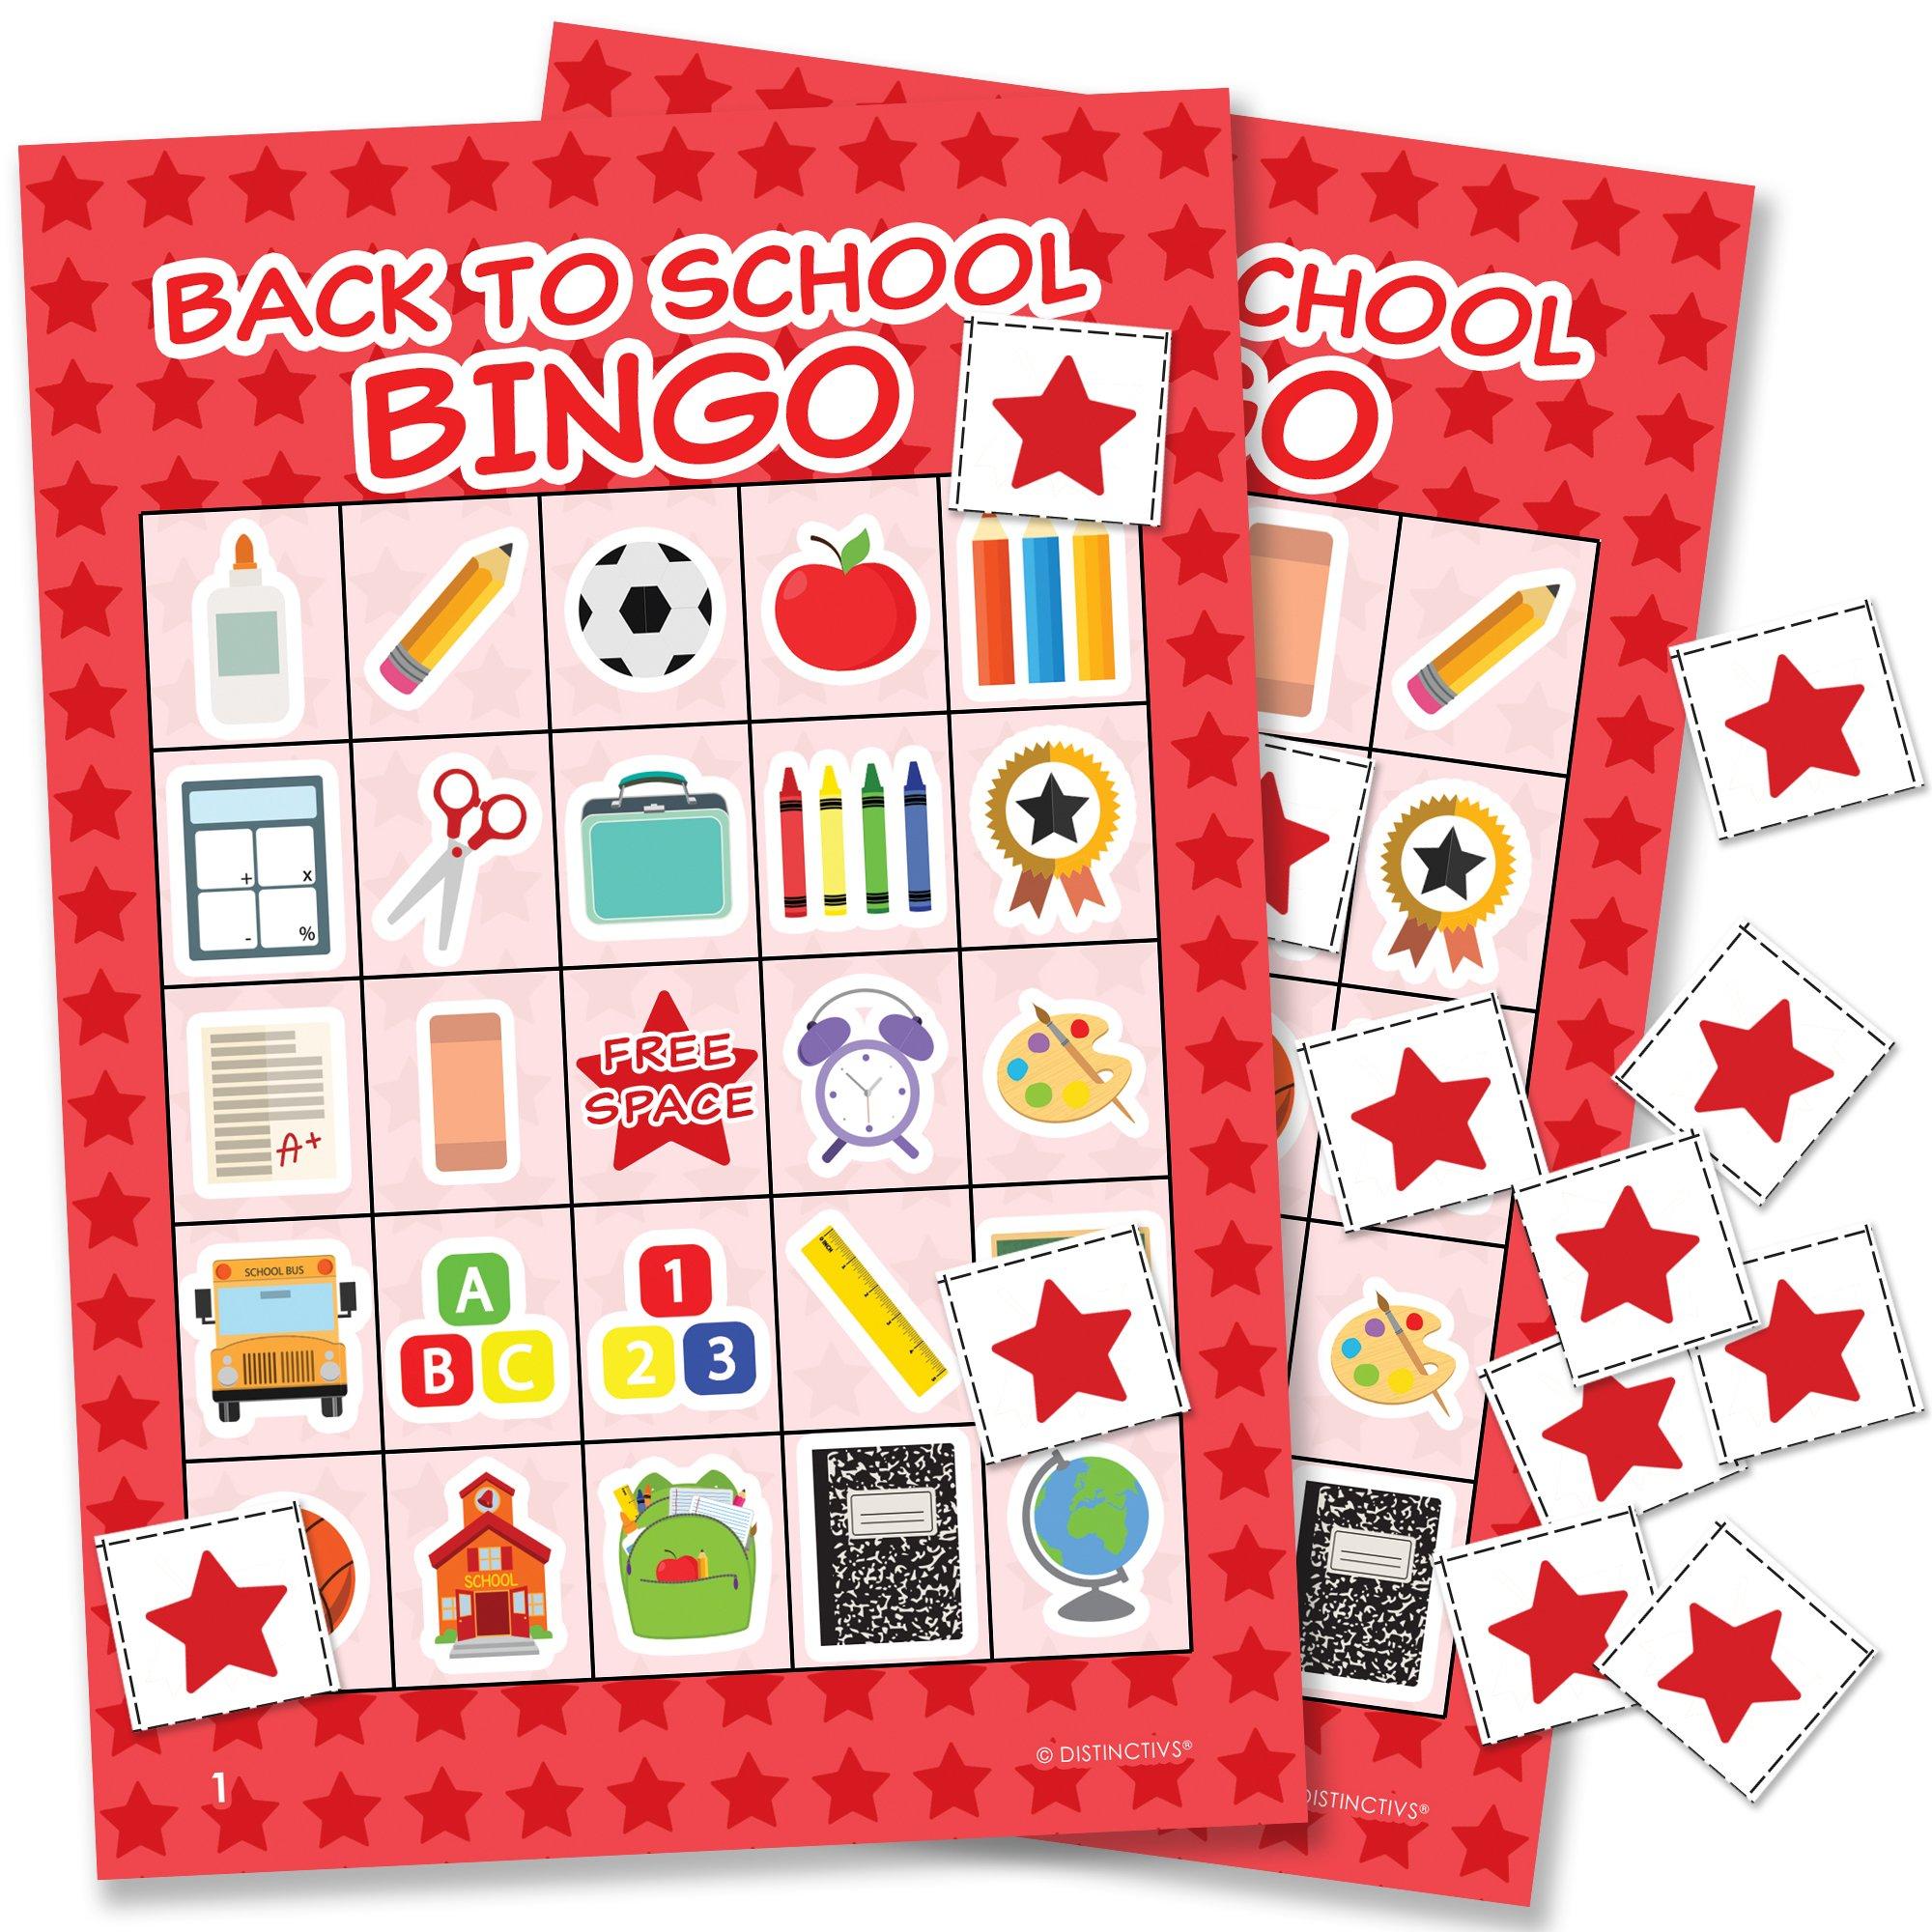 DISTINCTIVS Back to School Bingo - 24 Players by DISTINCTIVS